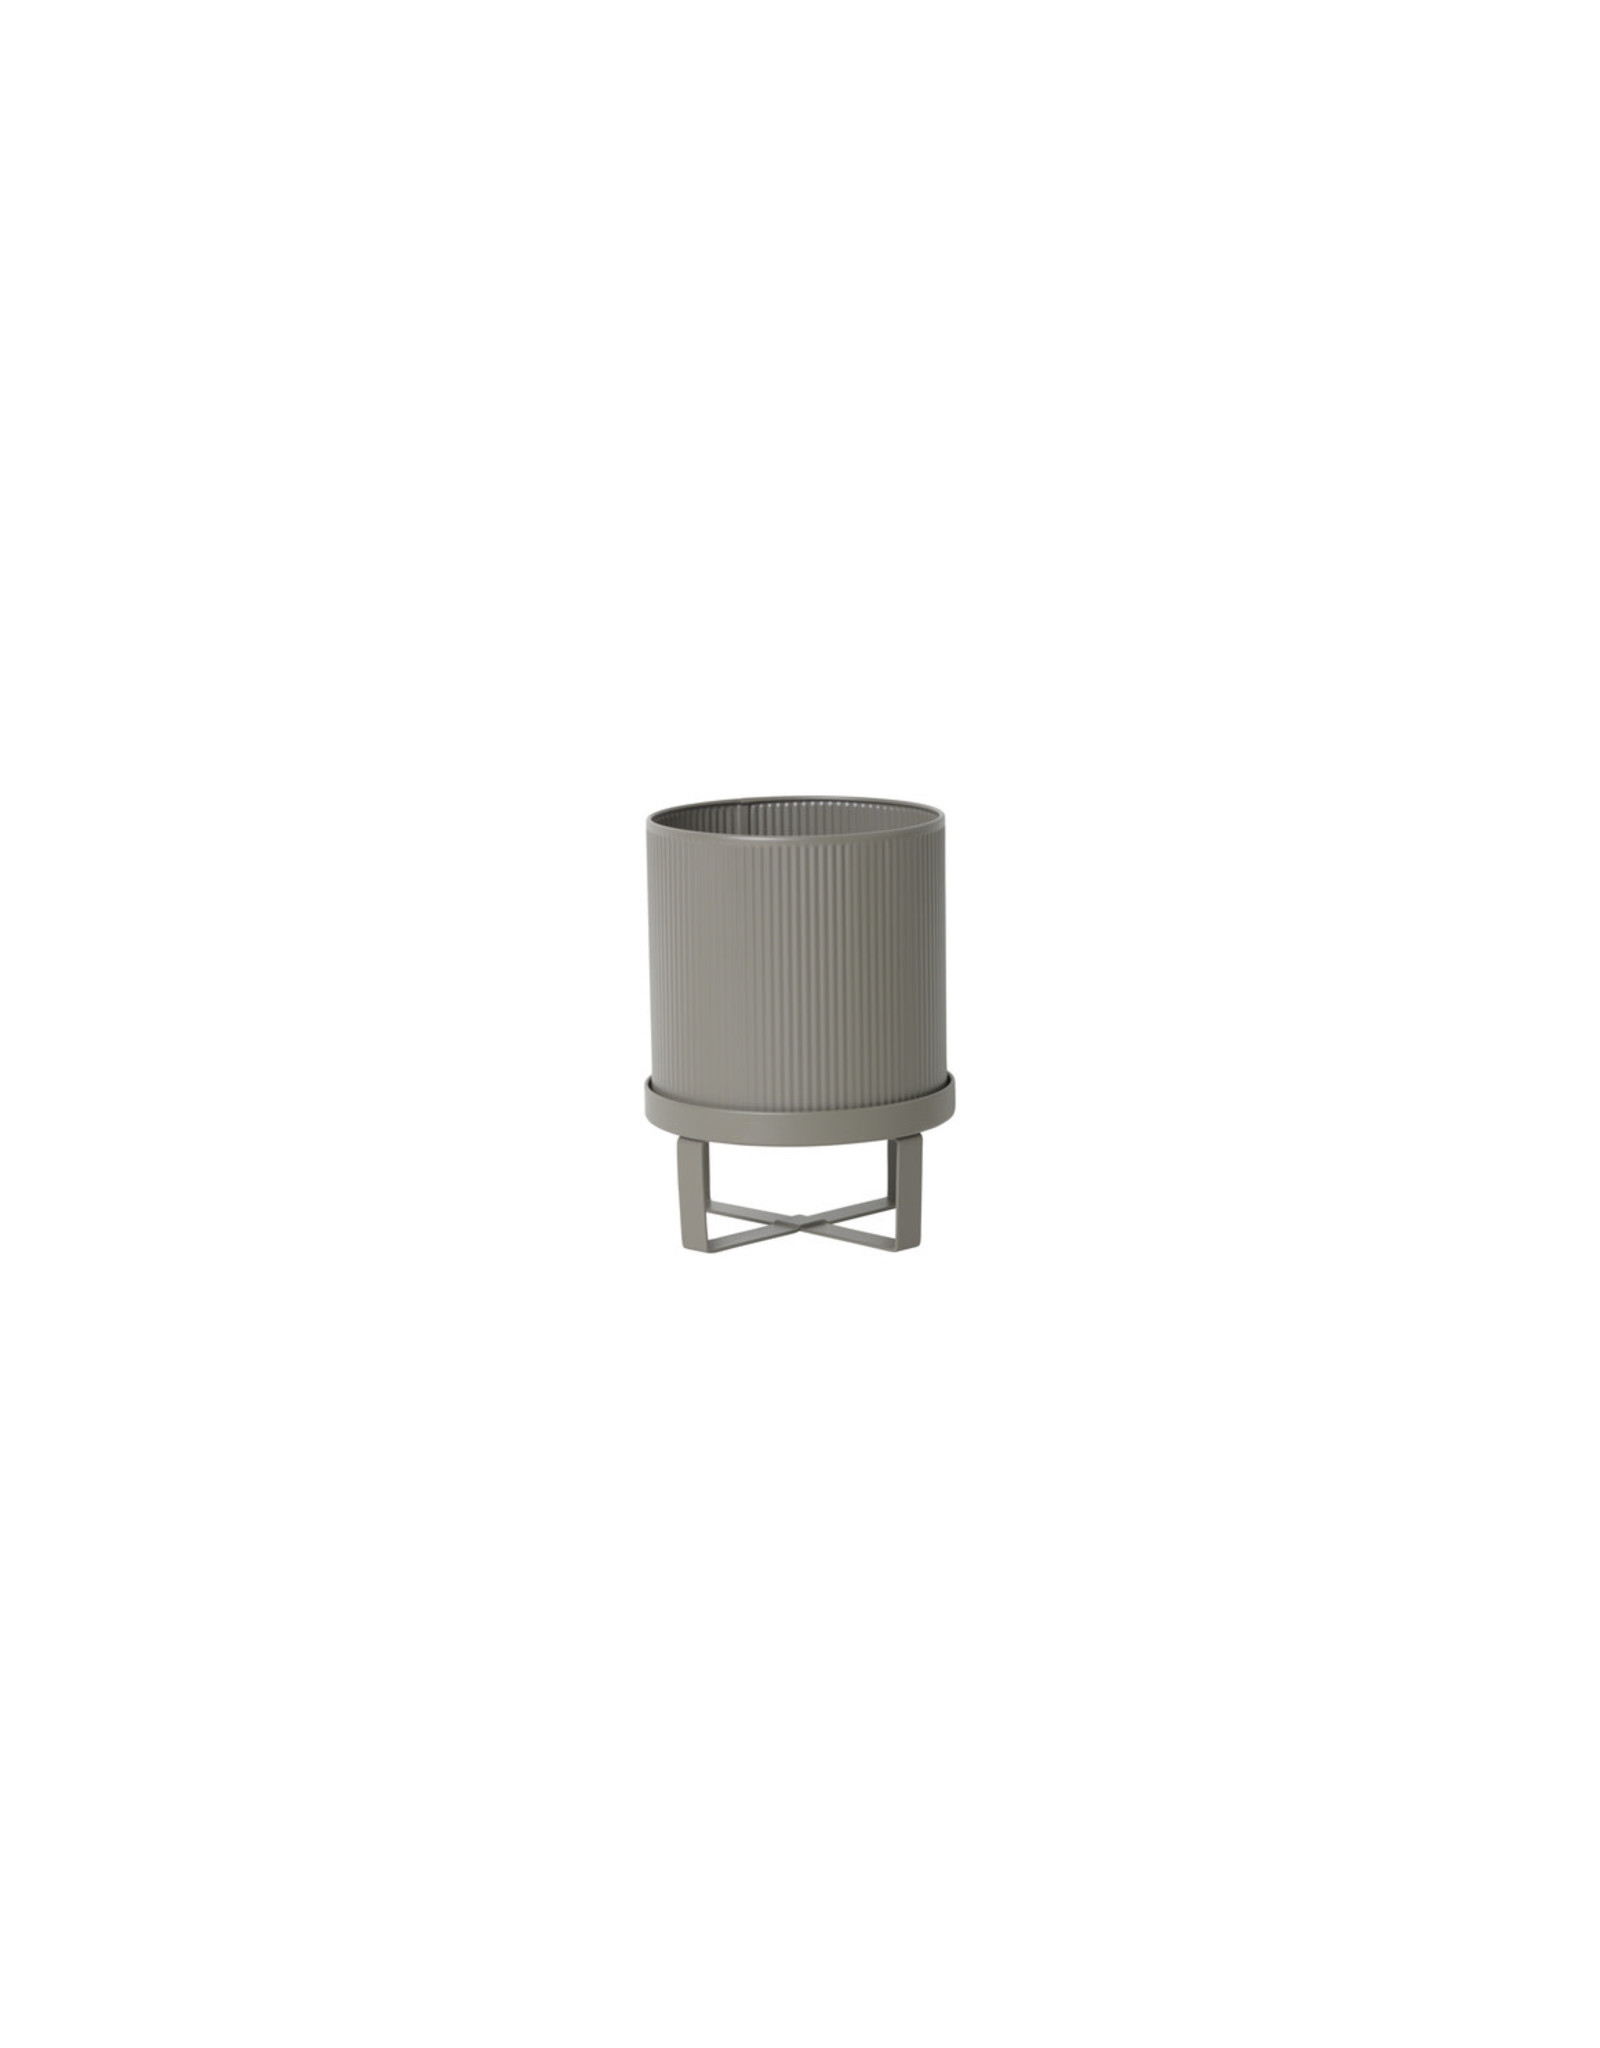 Ferm LIVING Ferm LIVING Bau Pot Small Warm Grey